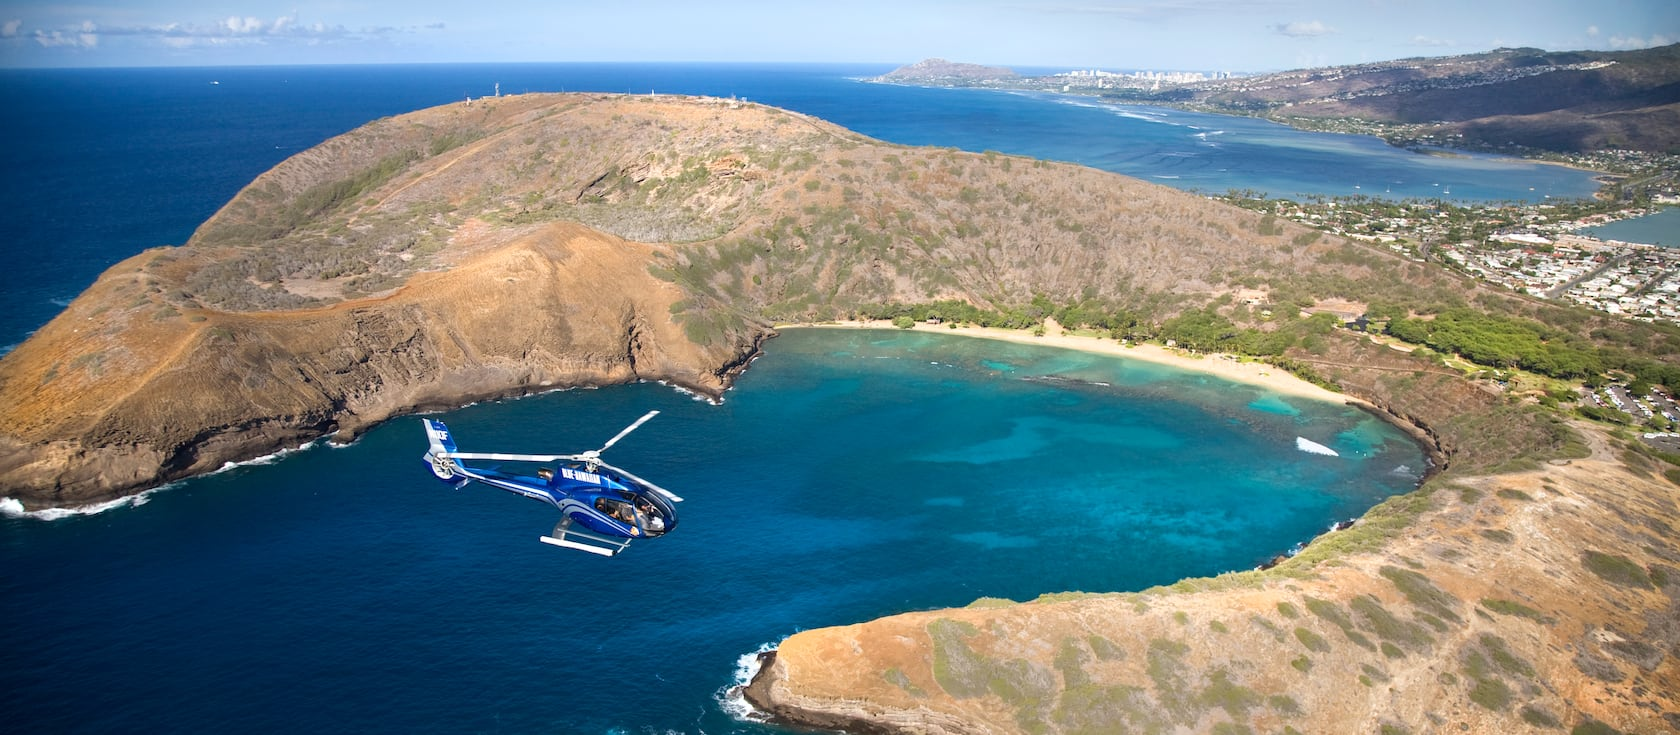 A helicopter flies over Hanauma Bay on the island of Oahu in the Hawaiian Islands